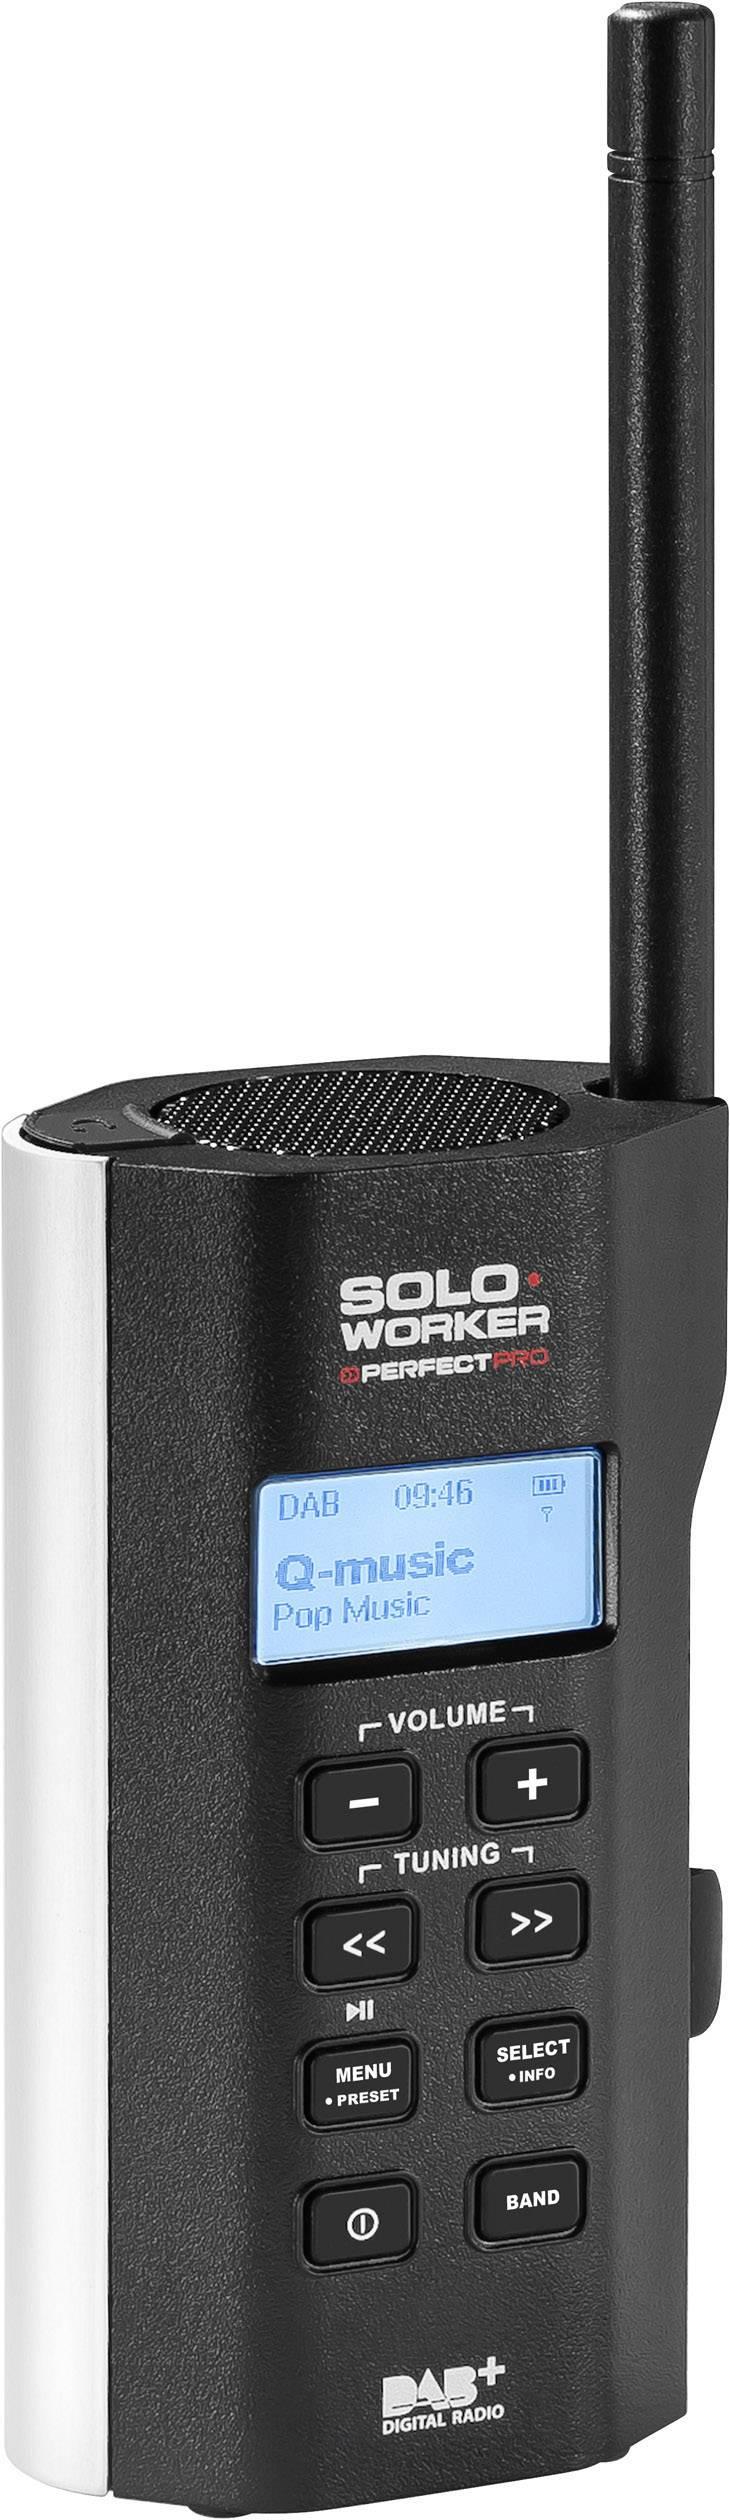 DAB+ rádio na stavbu PerfectPro Soloworker DAB+ AUX čierna